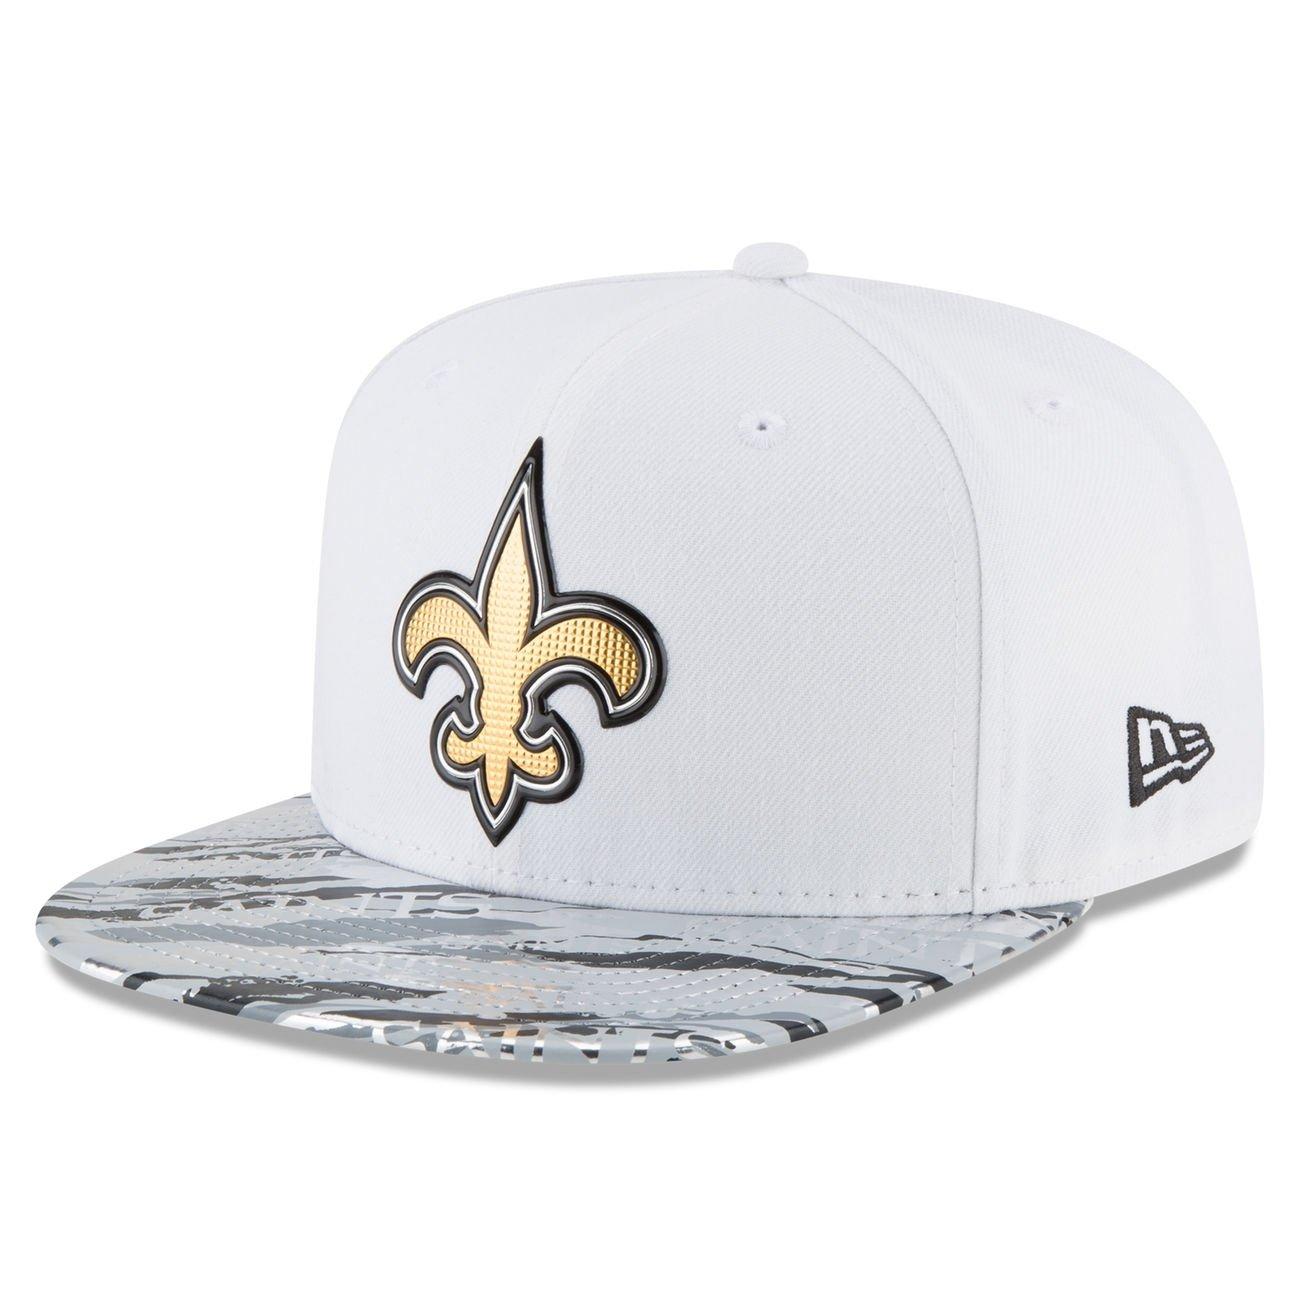 33a99114 New Era New Orleans Saints 2016 Color Rush Snapback NFL Cap: Amazon ...